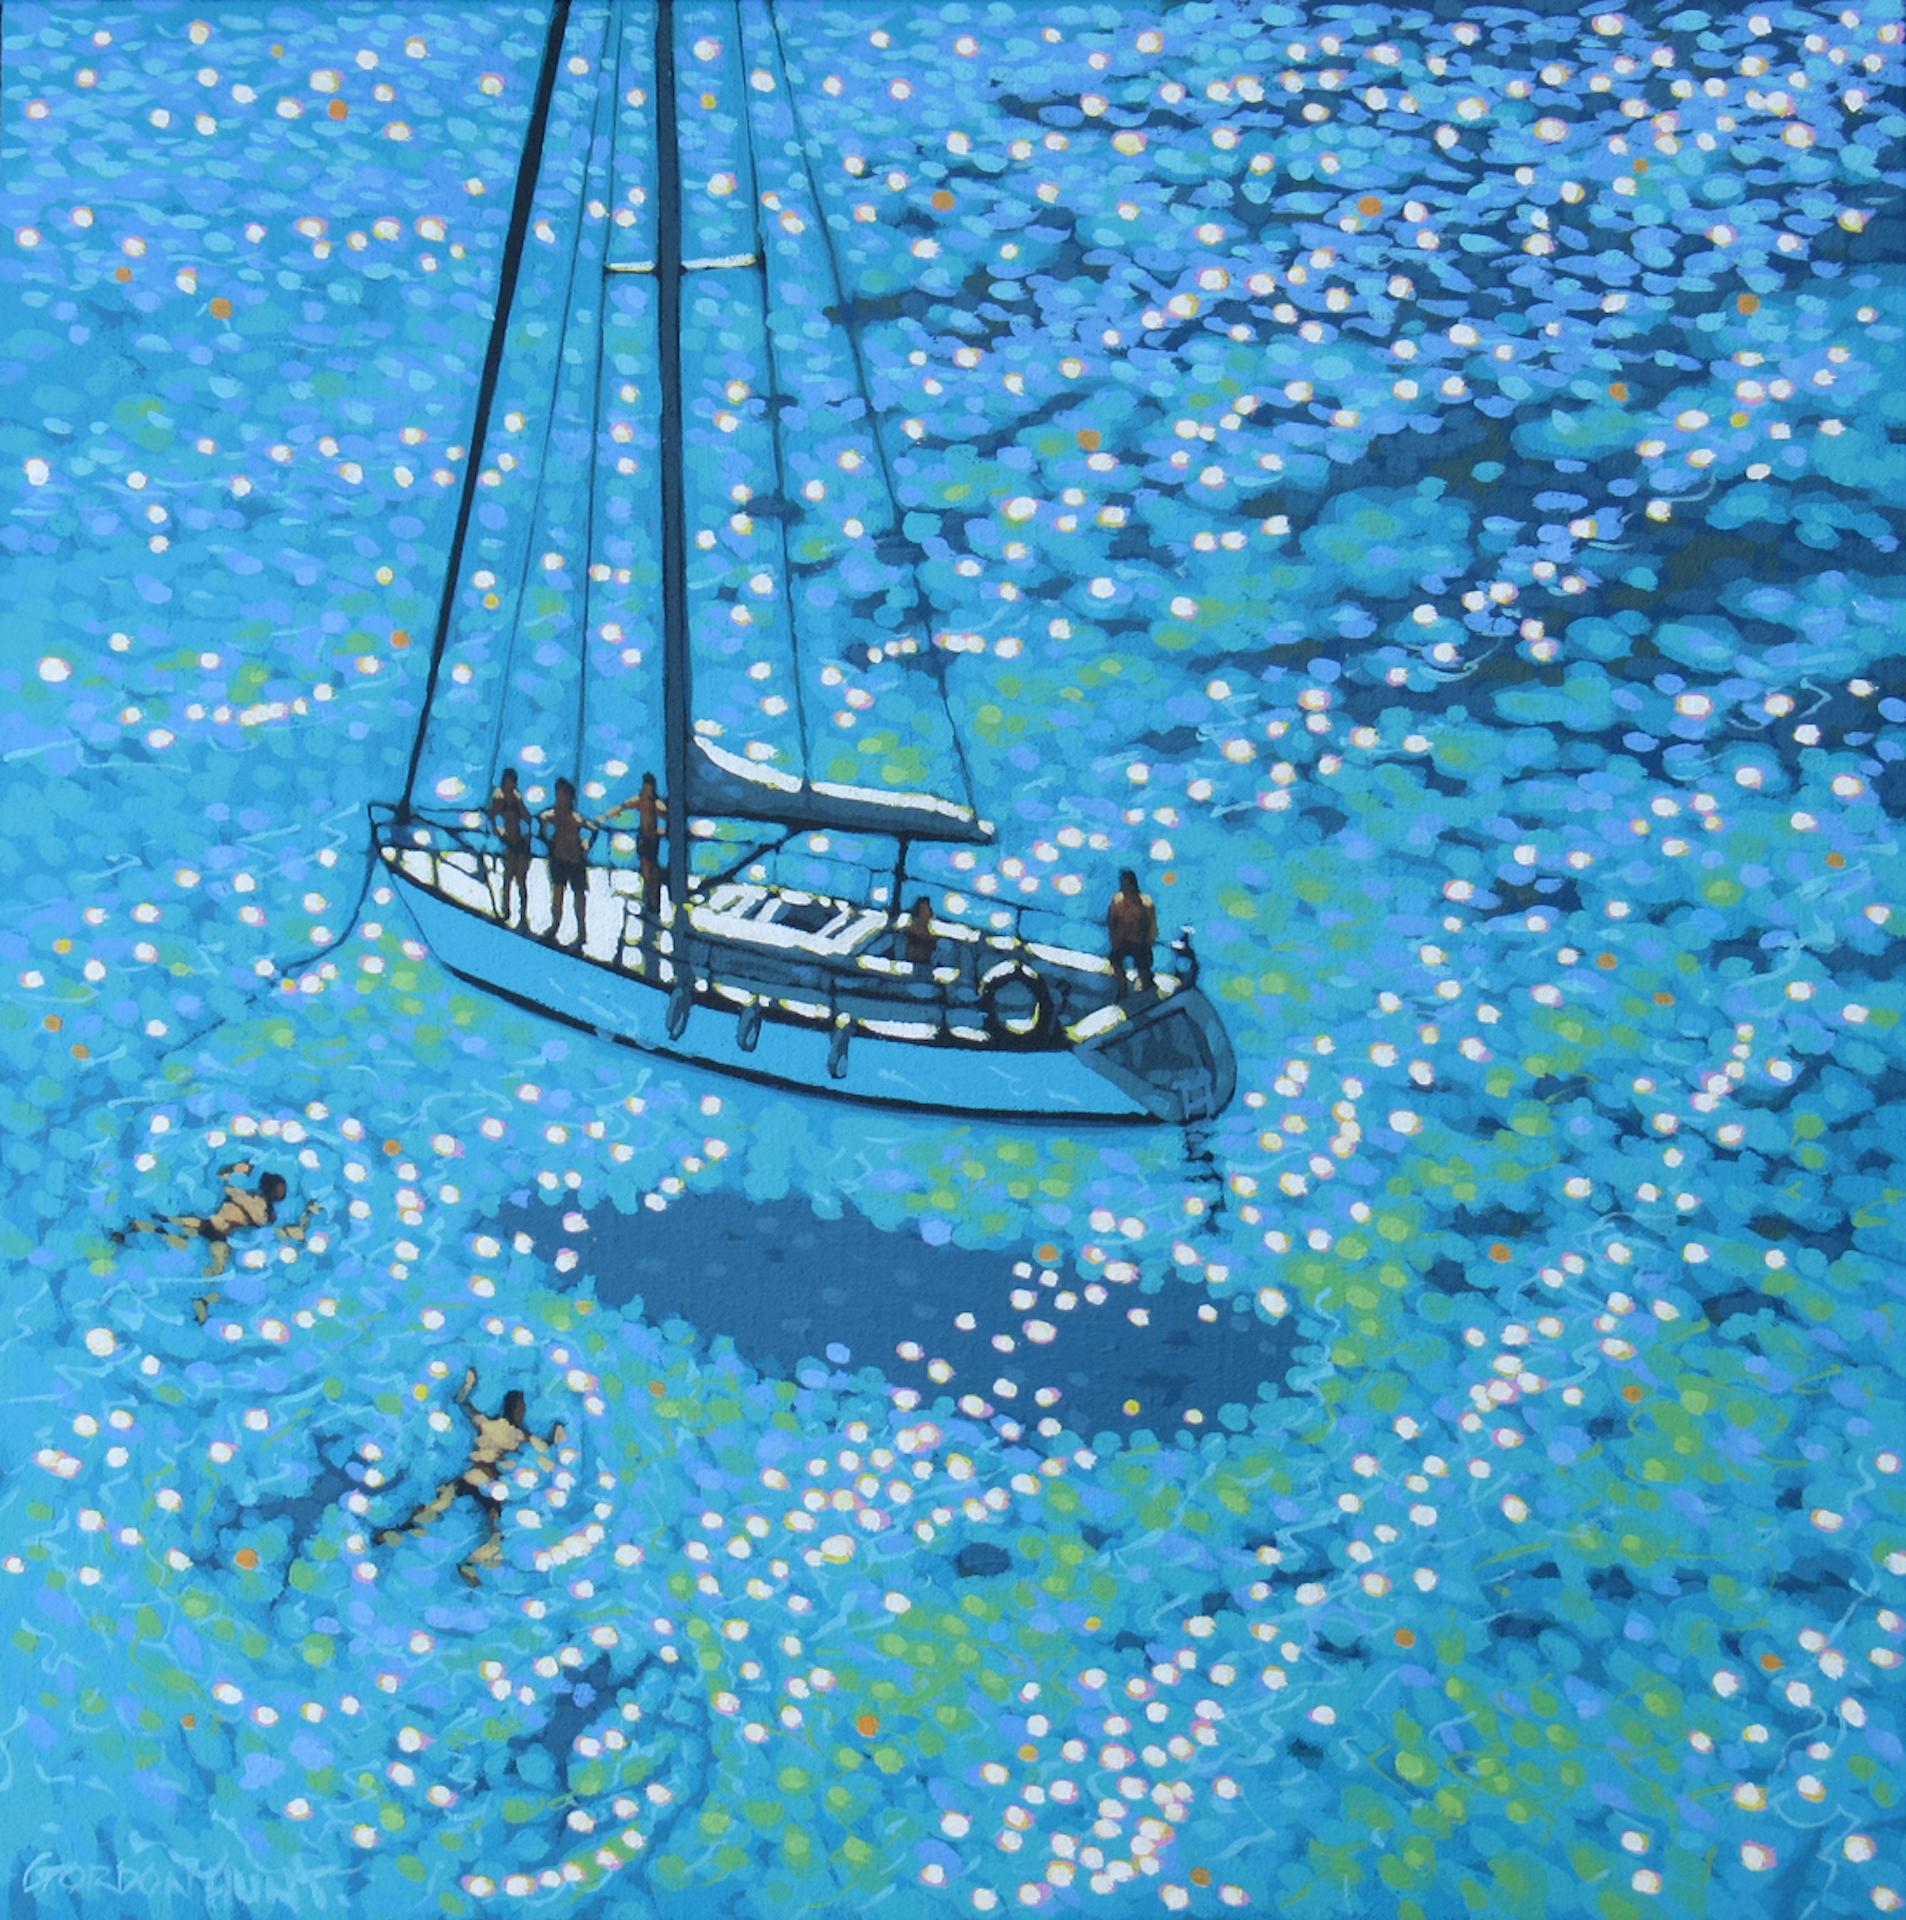 Gordon Hunt, Sailing swim, Seascape Art, Original Seascape Painting, Cornish Art